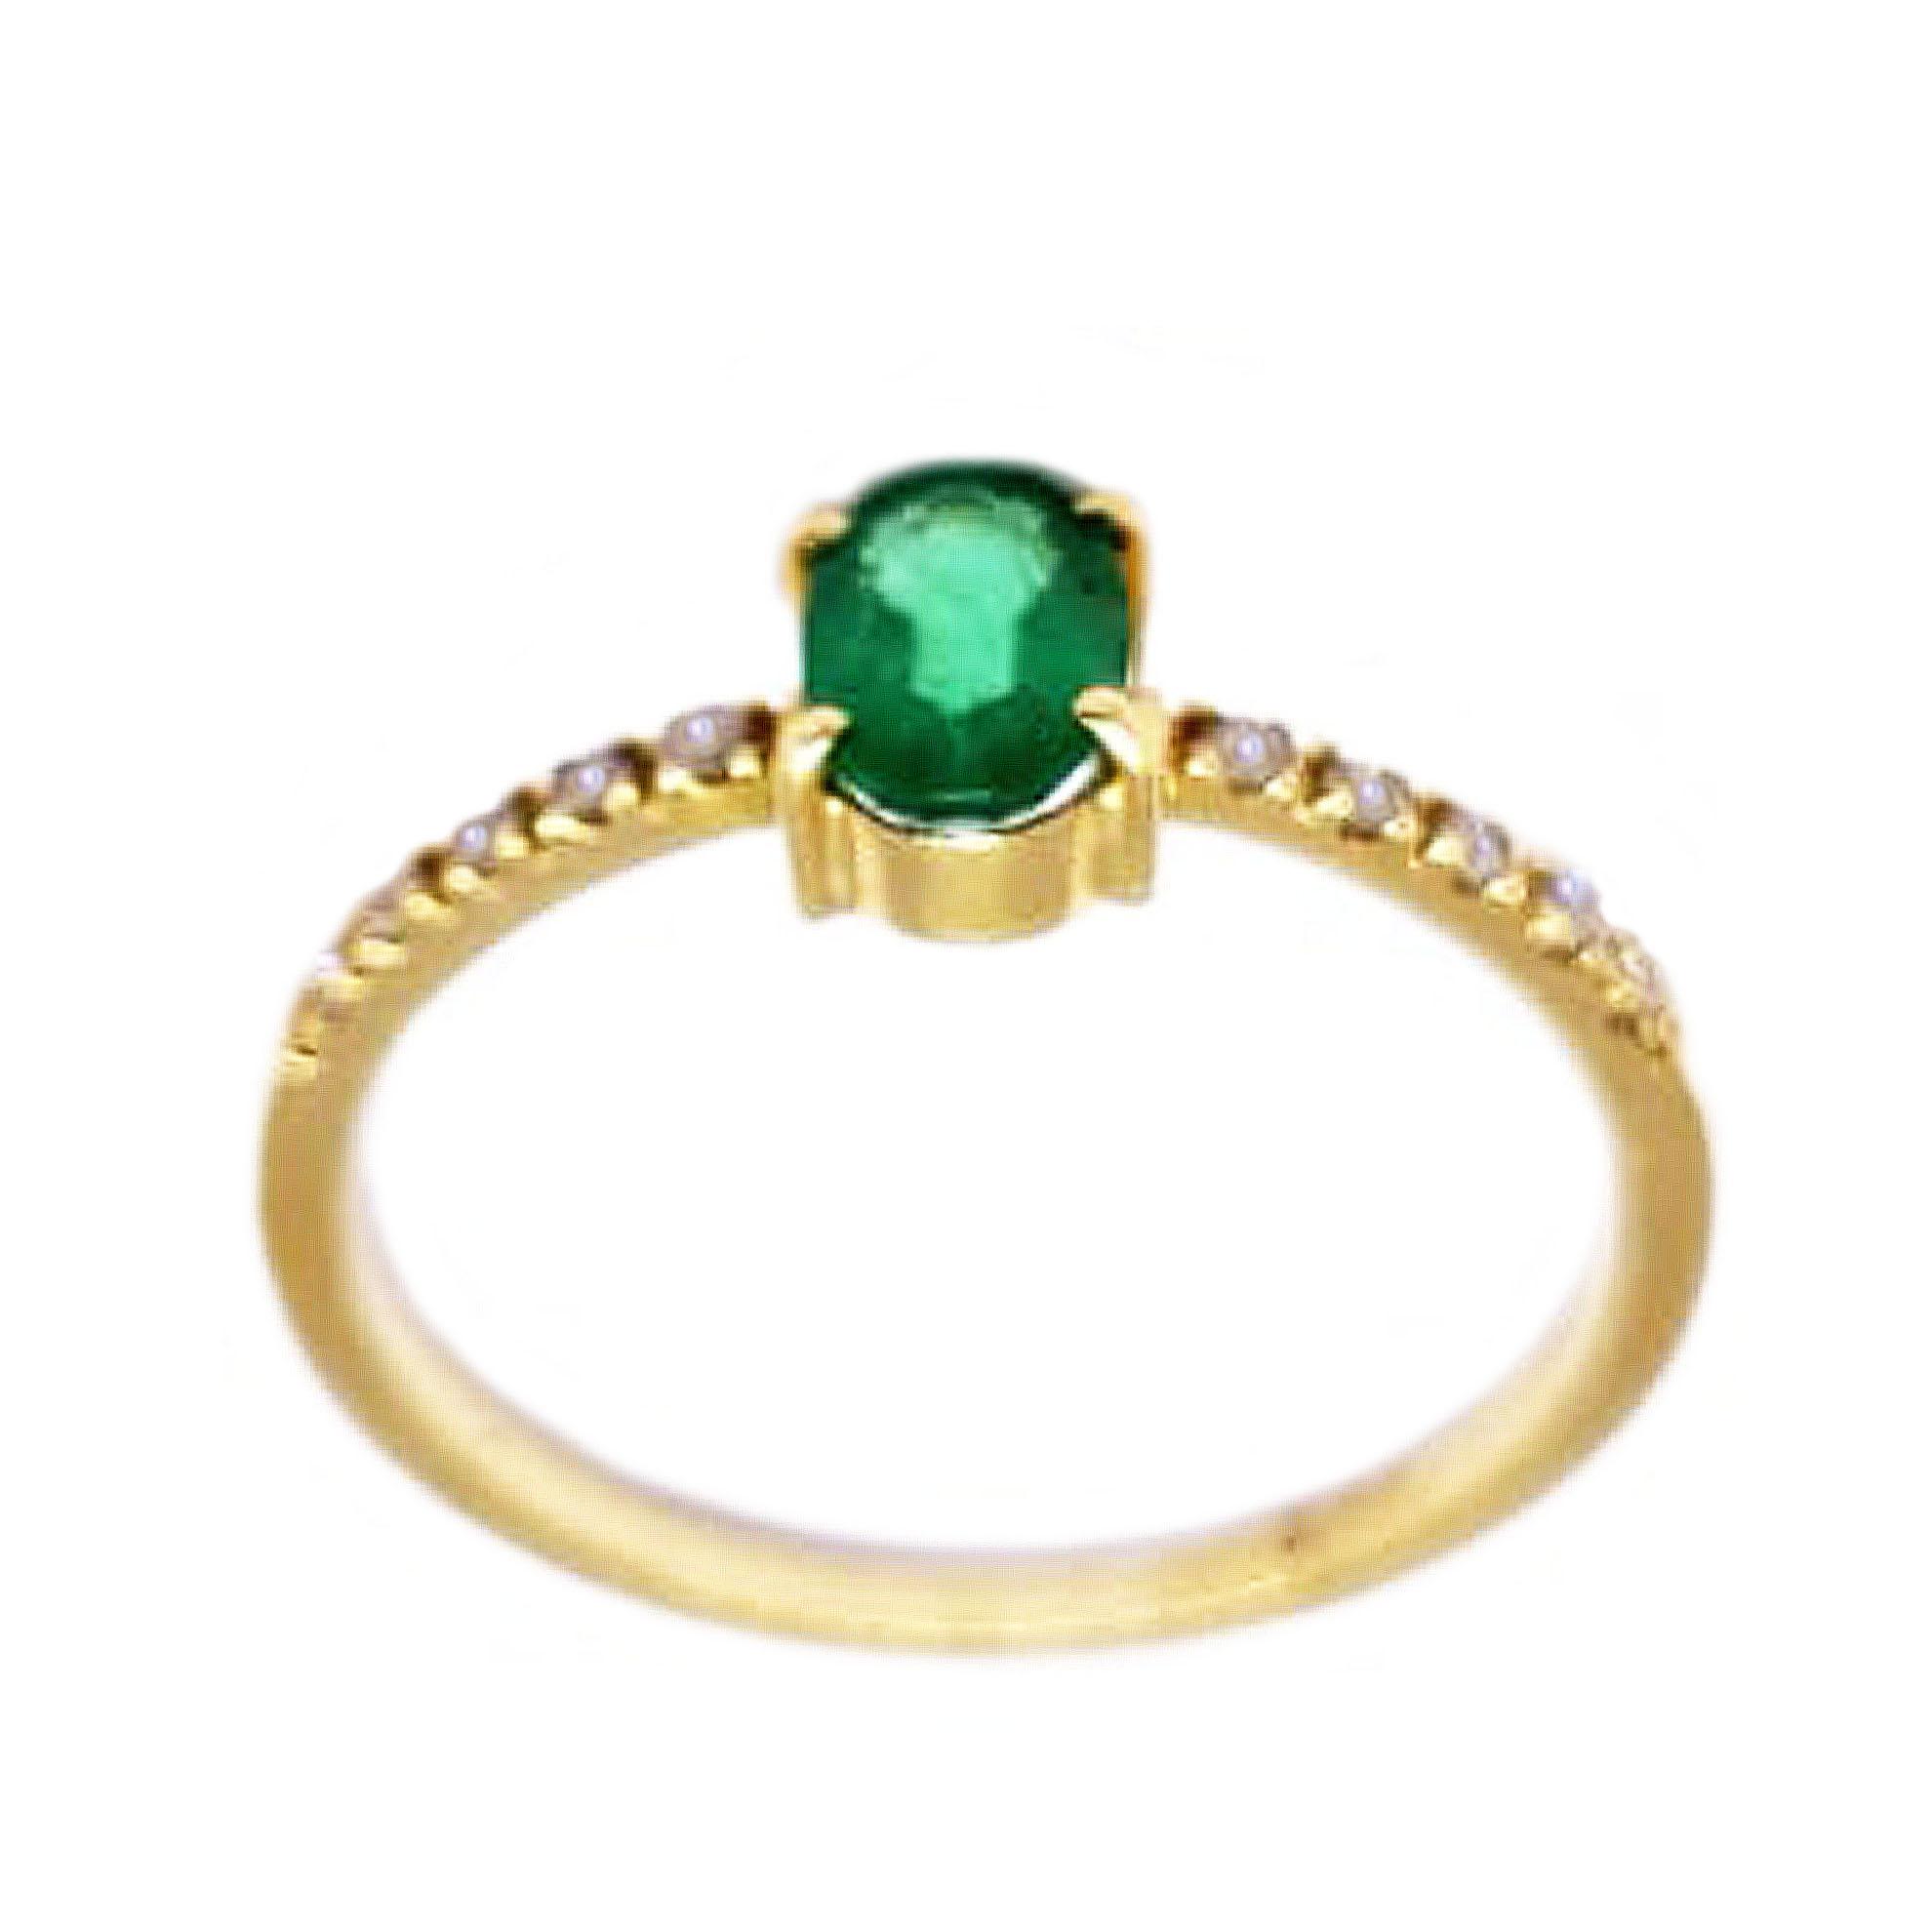 Anel Esmeralda Oval c/ Diamantes em Ouro 18 Kilates